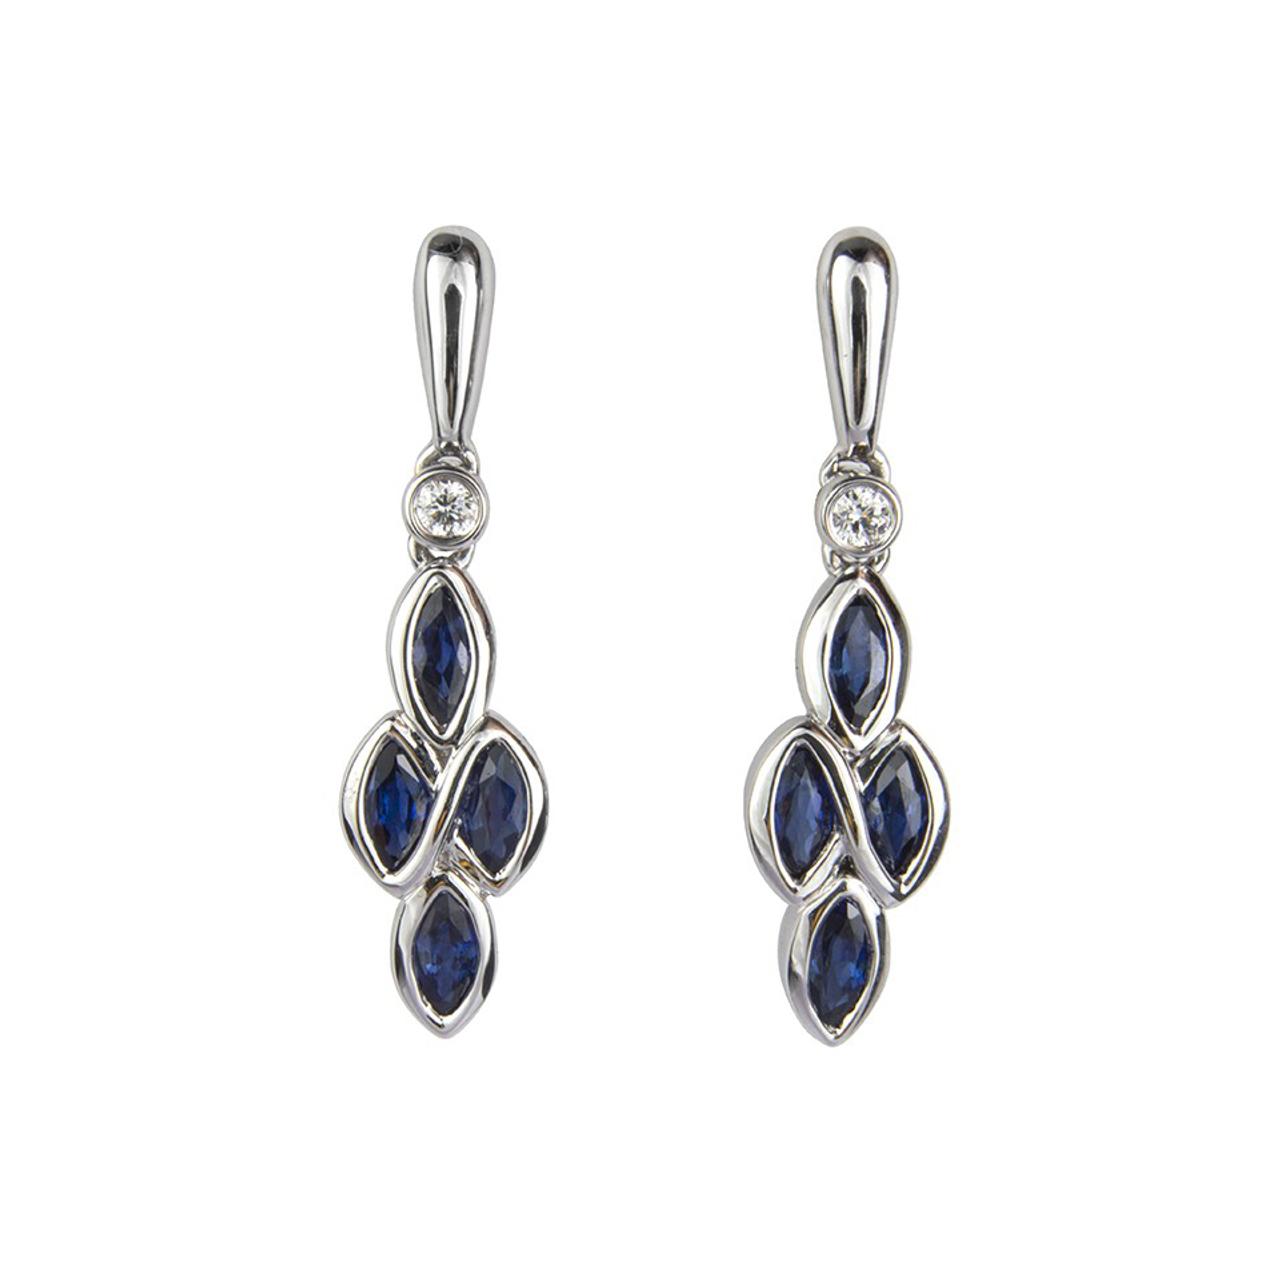 18ct White Gold Sapphire & Diamond Eternal Earrings